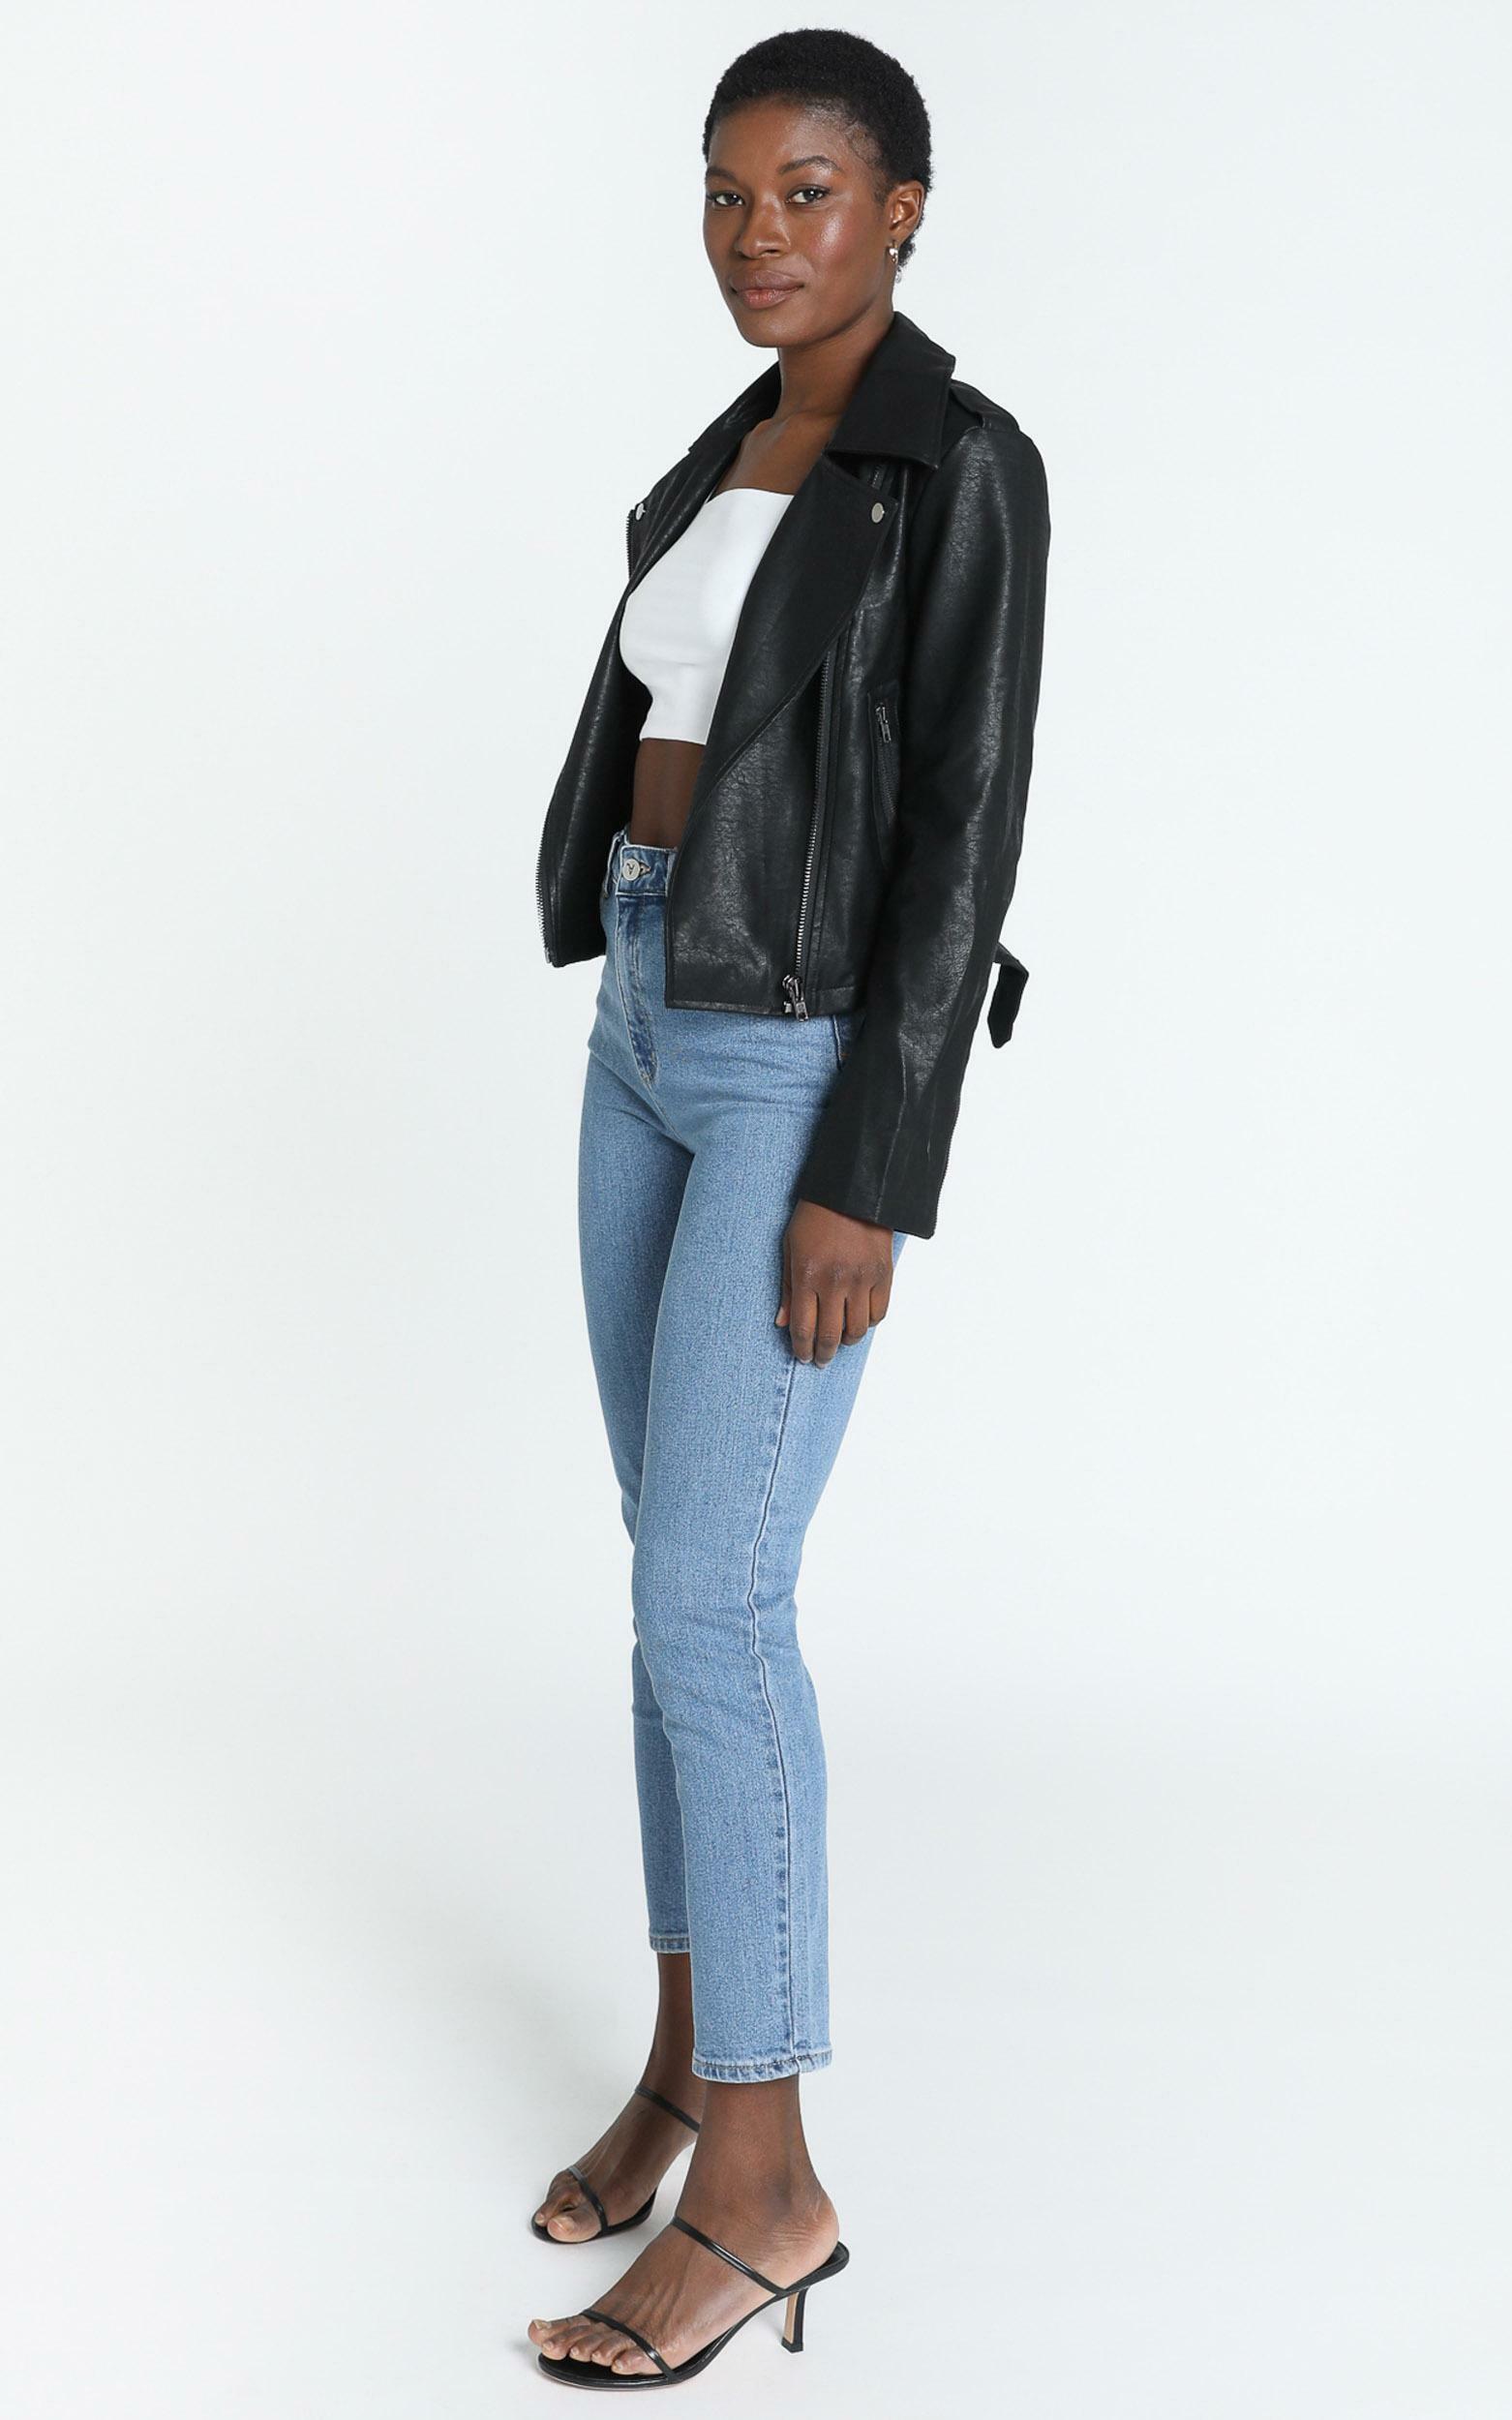 Your Desire Jacket in Black Leatherette - 14 (XL), Black, hi-res image number null